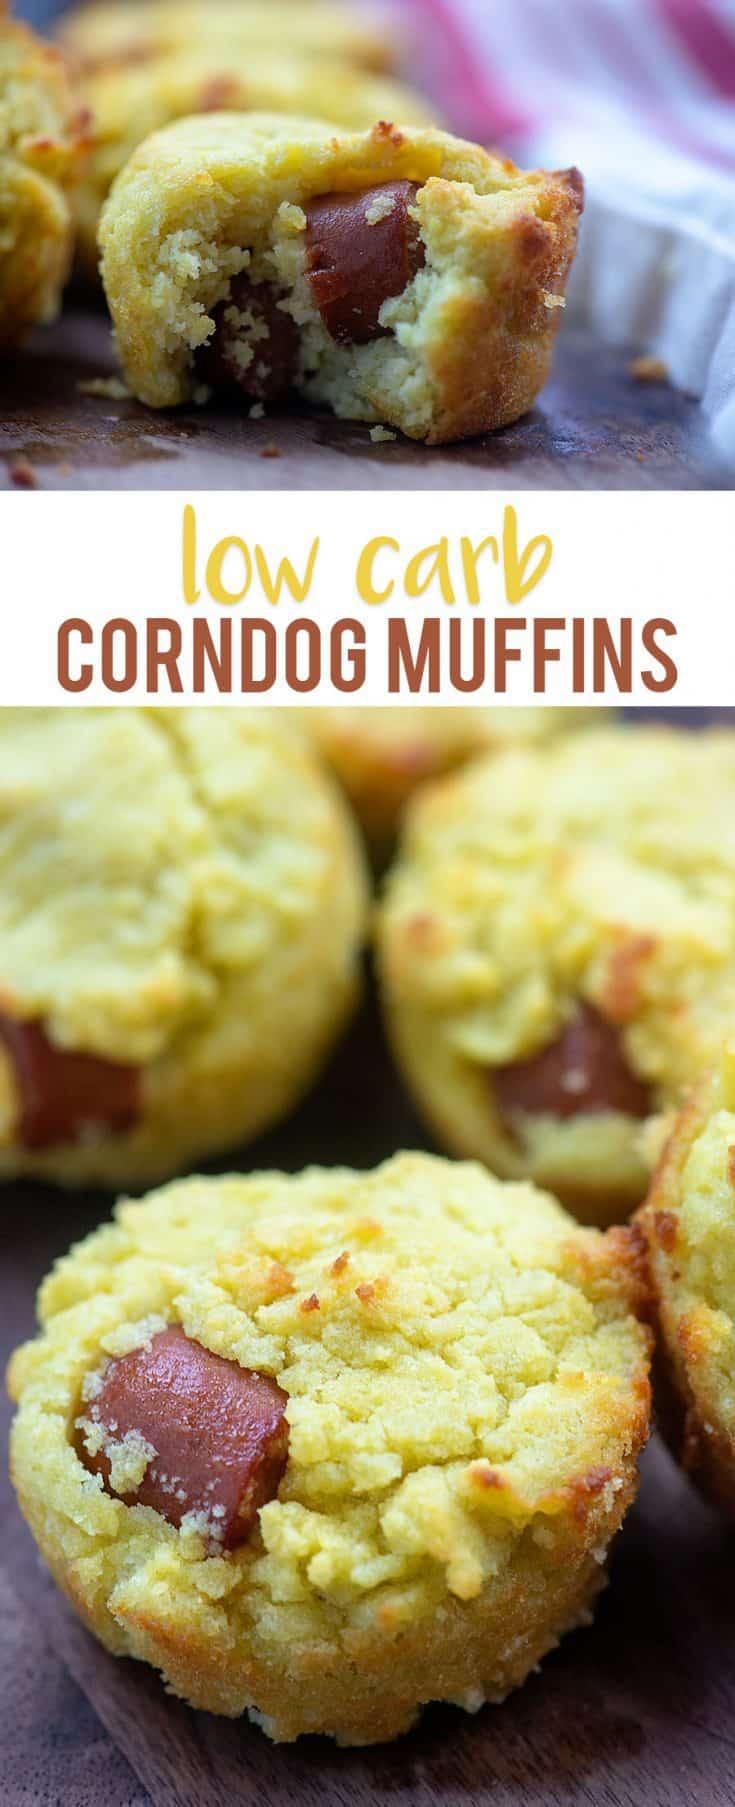 Low carb corn dog muffins! Tastes just like cornbread, but made with ZERO corn! #keto #lowcarb #corndog